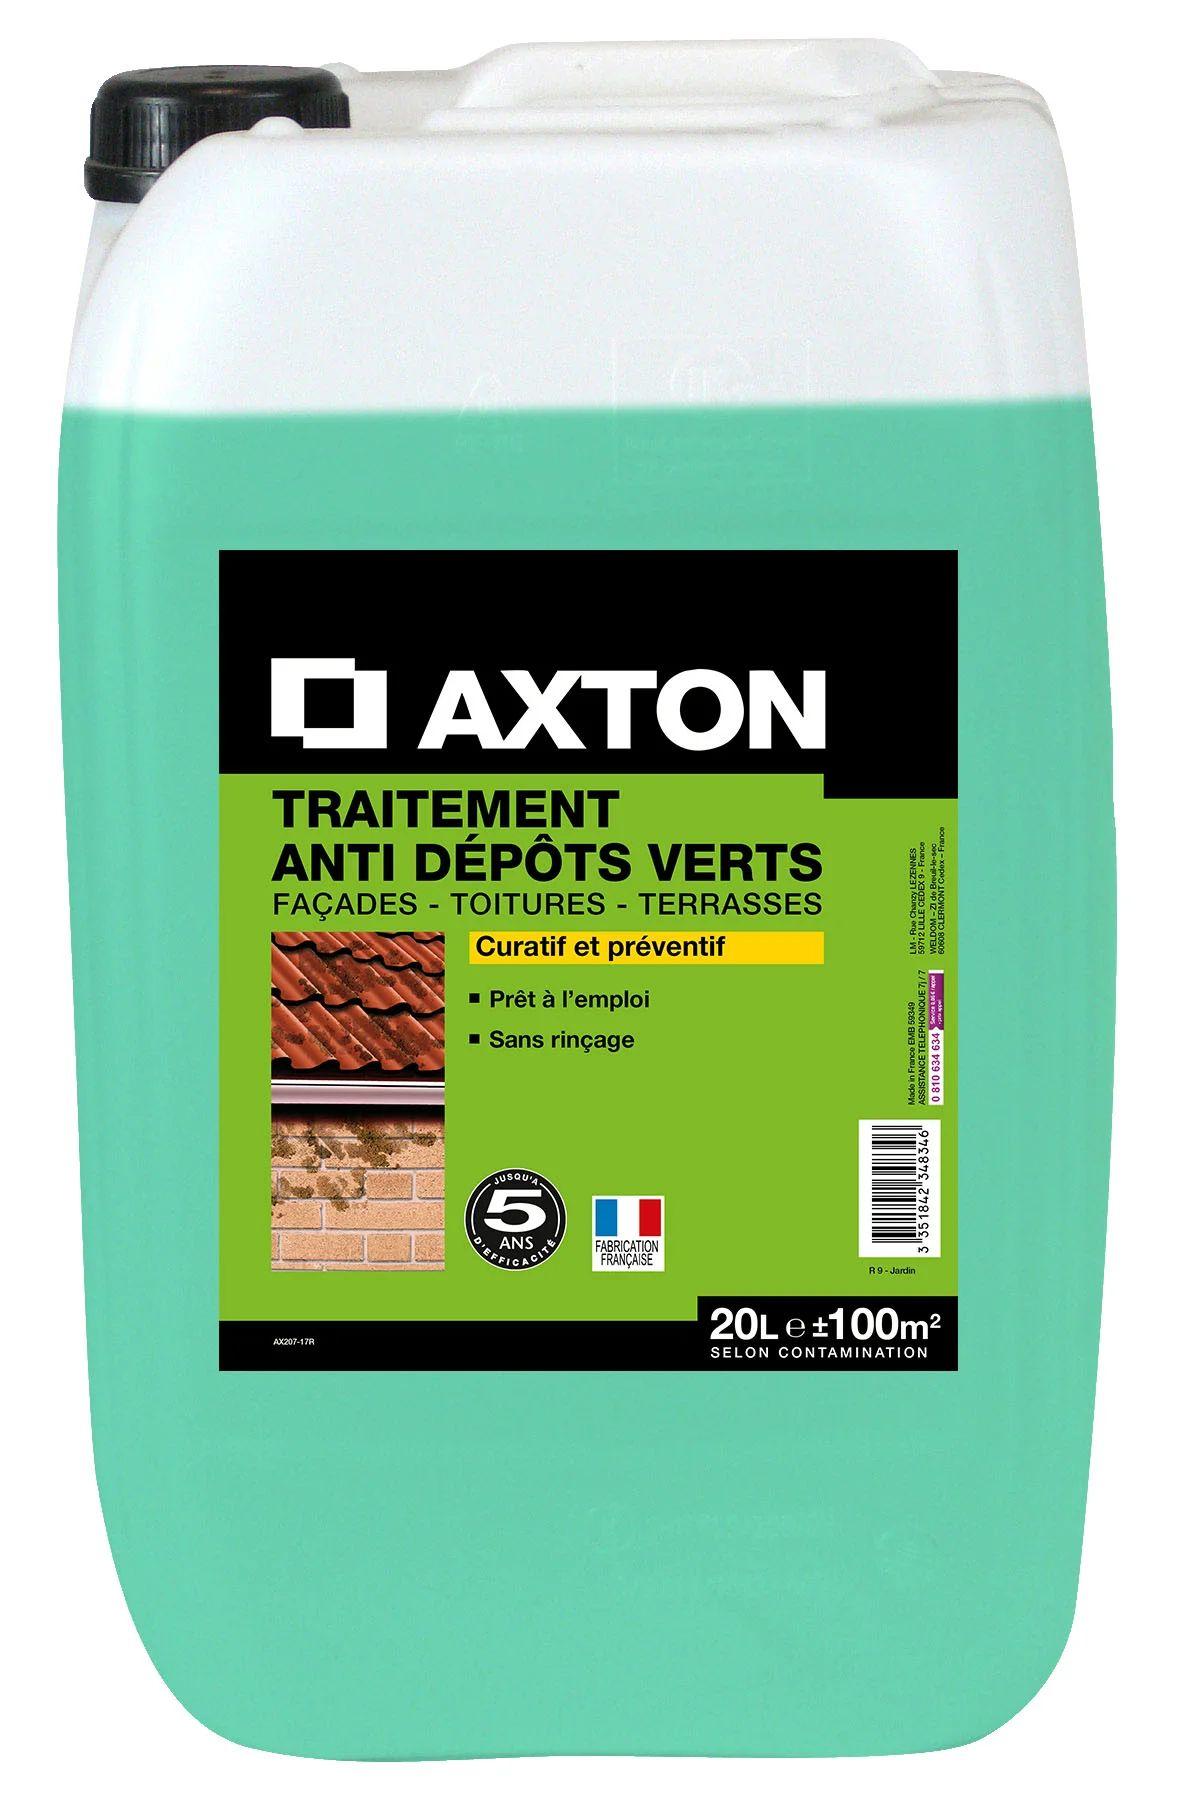 Traitement Anti Depots Verts Axton 20 L Leroy Merlin